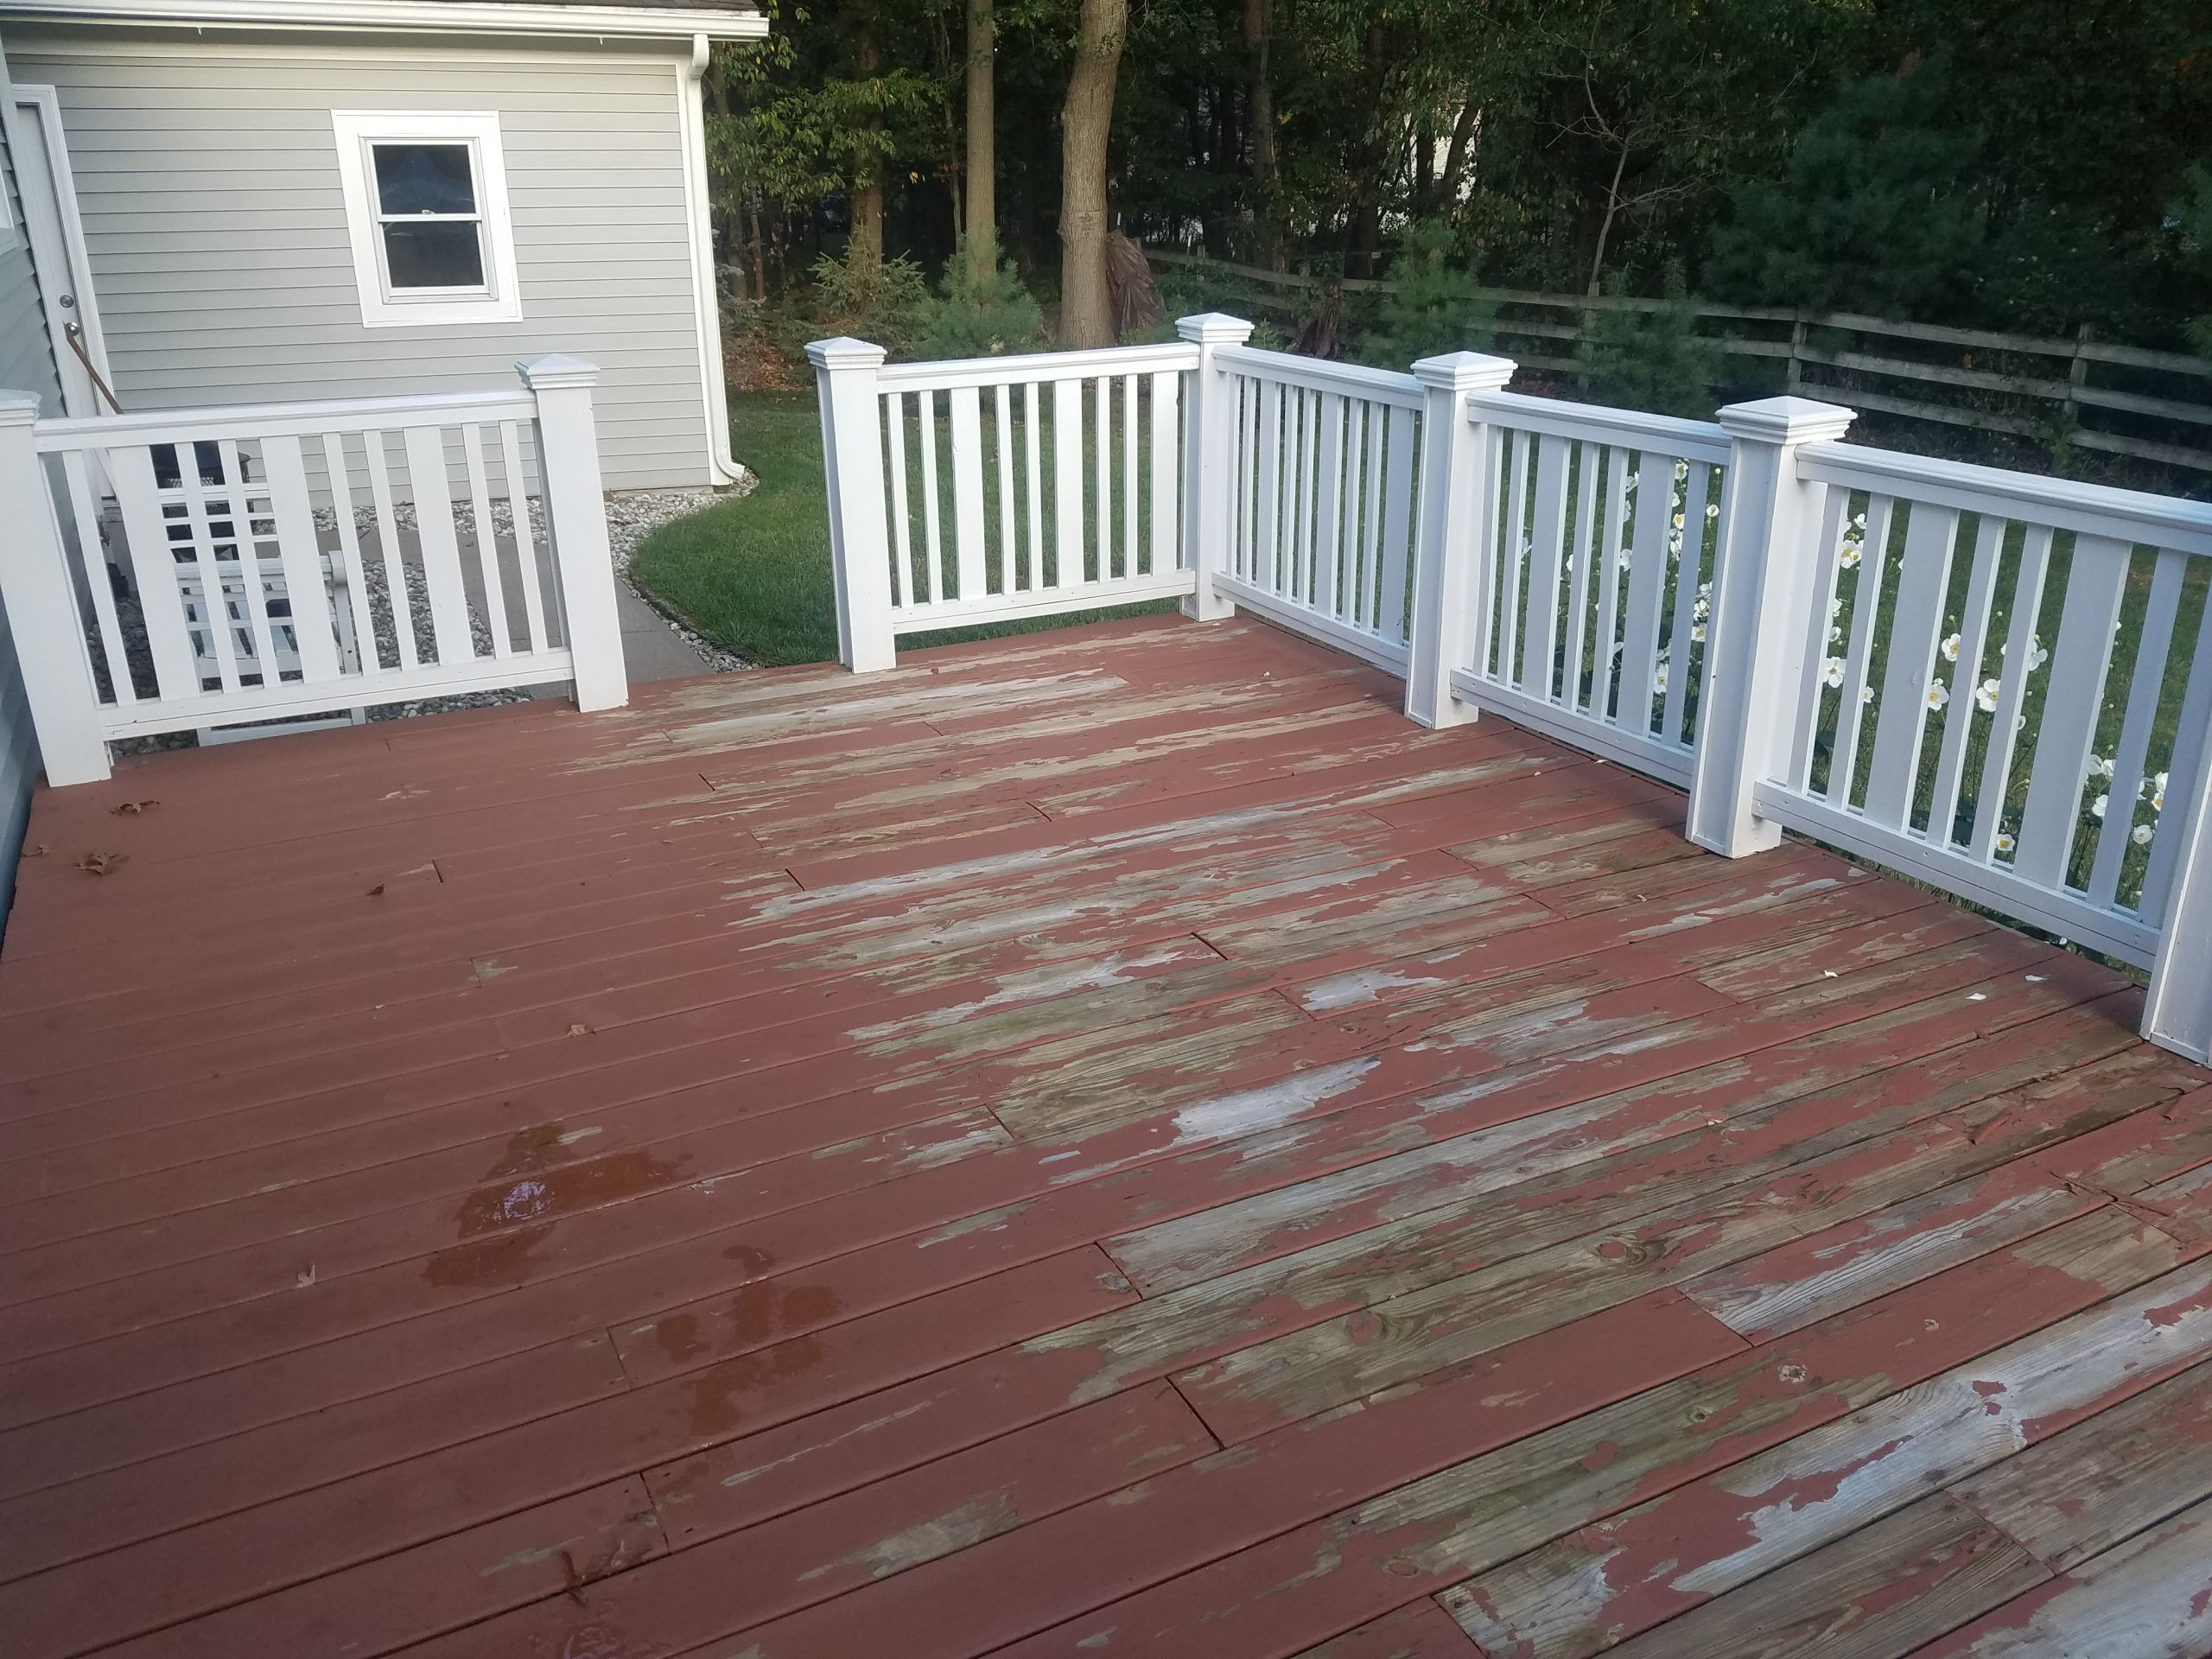 Best Deck Restoration Paint  Behr Deckover Olympic Rescue It Rust Oleum Deck Restore